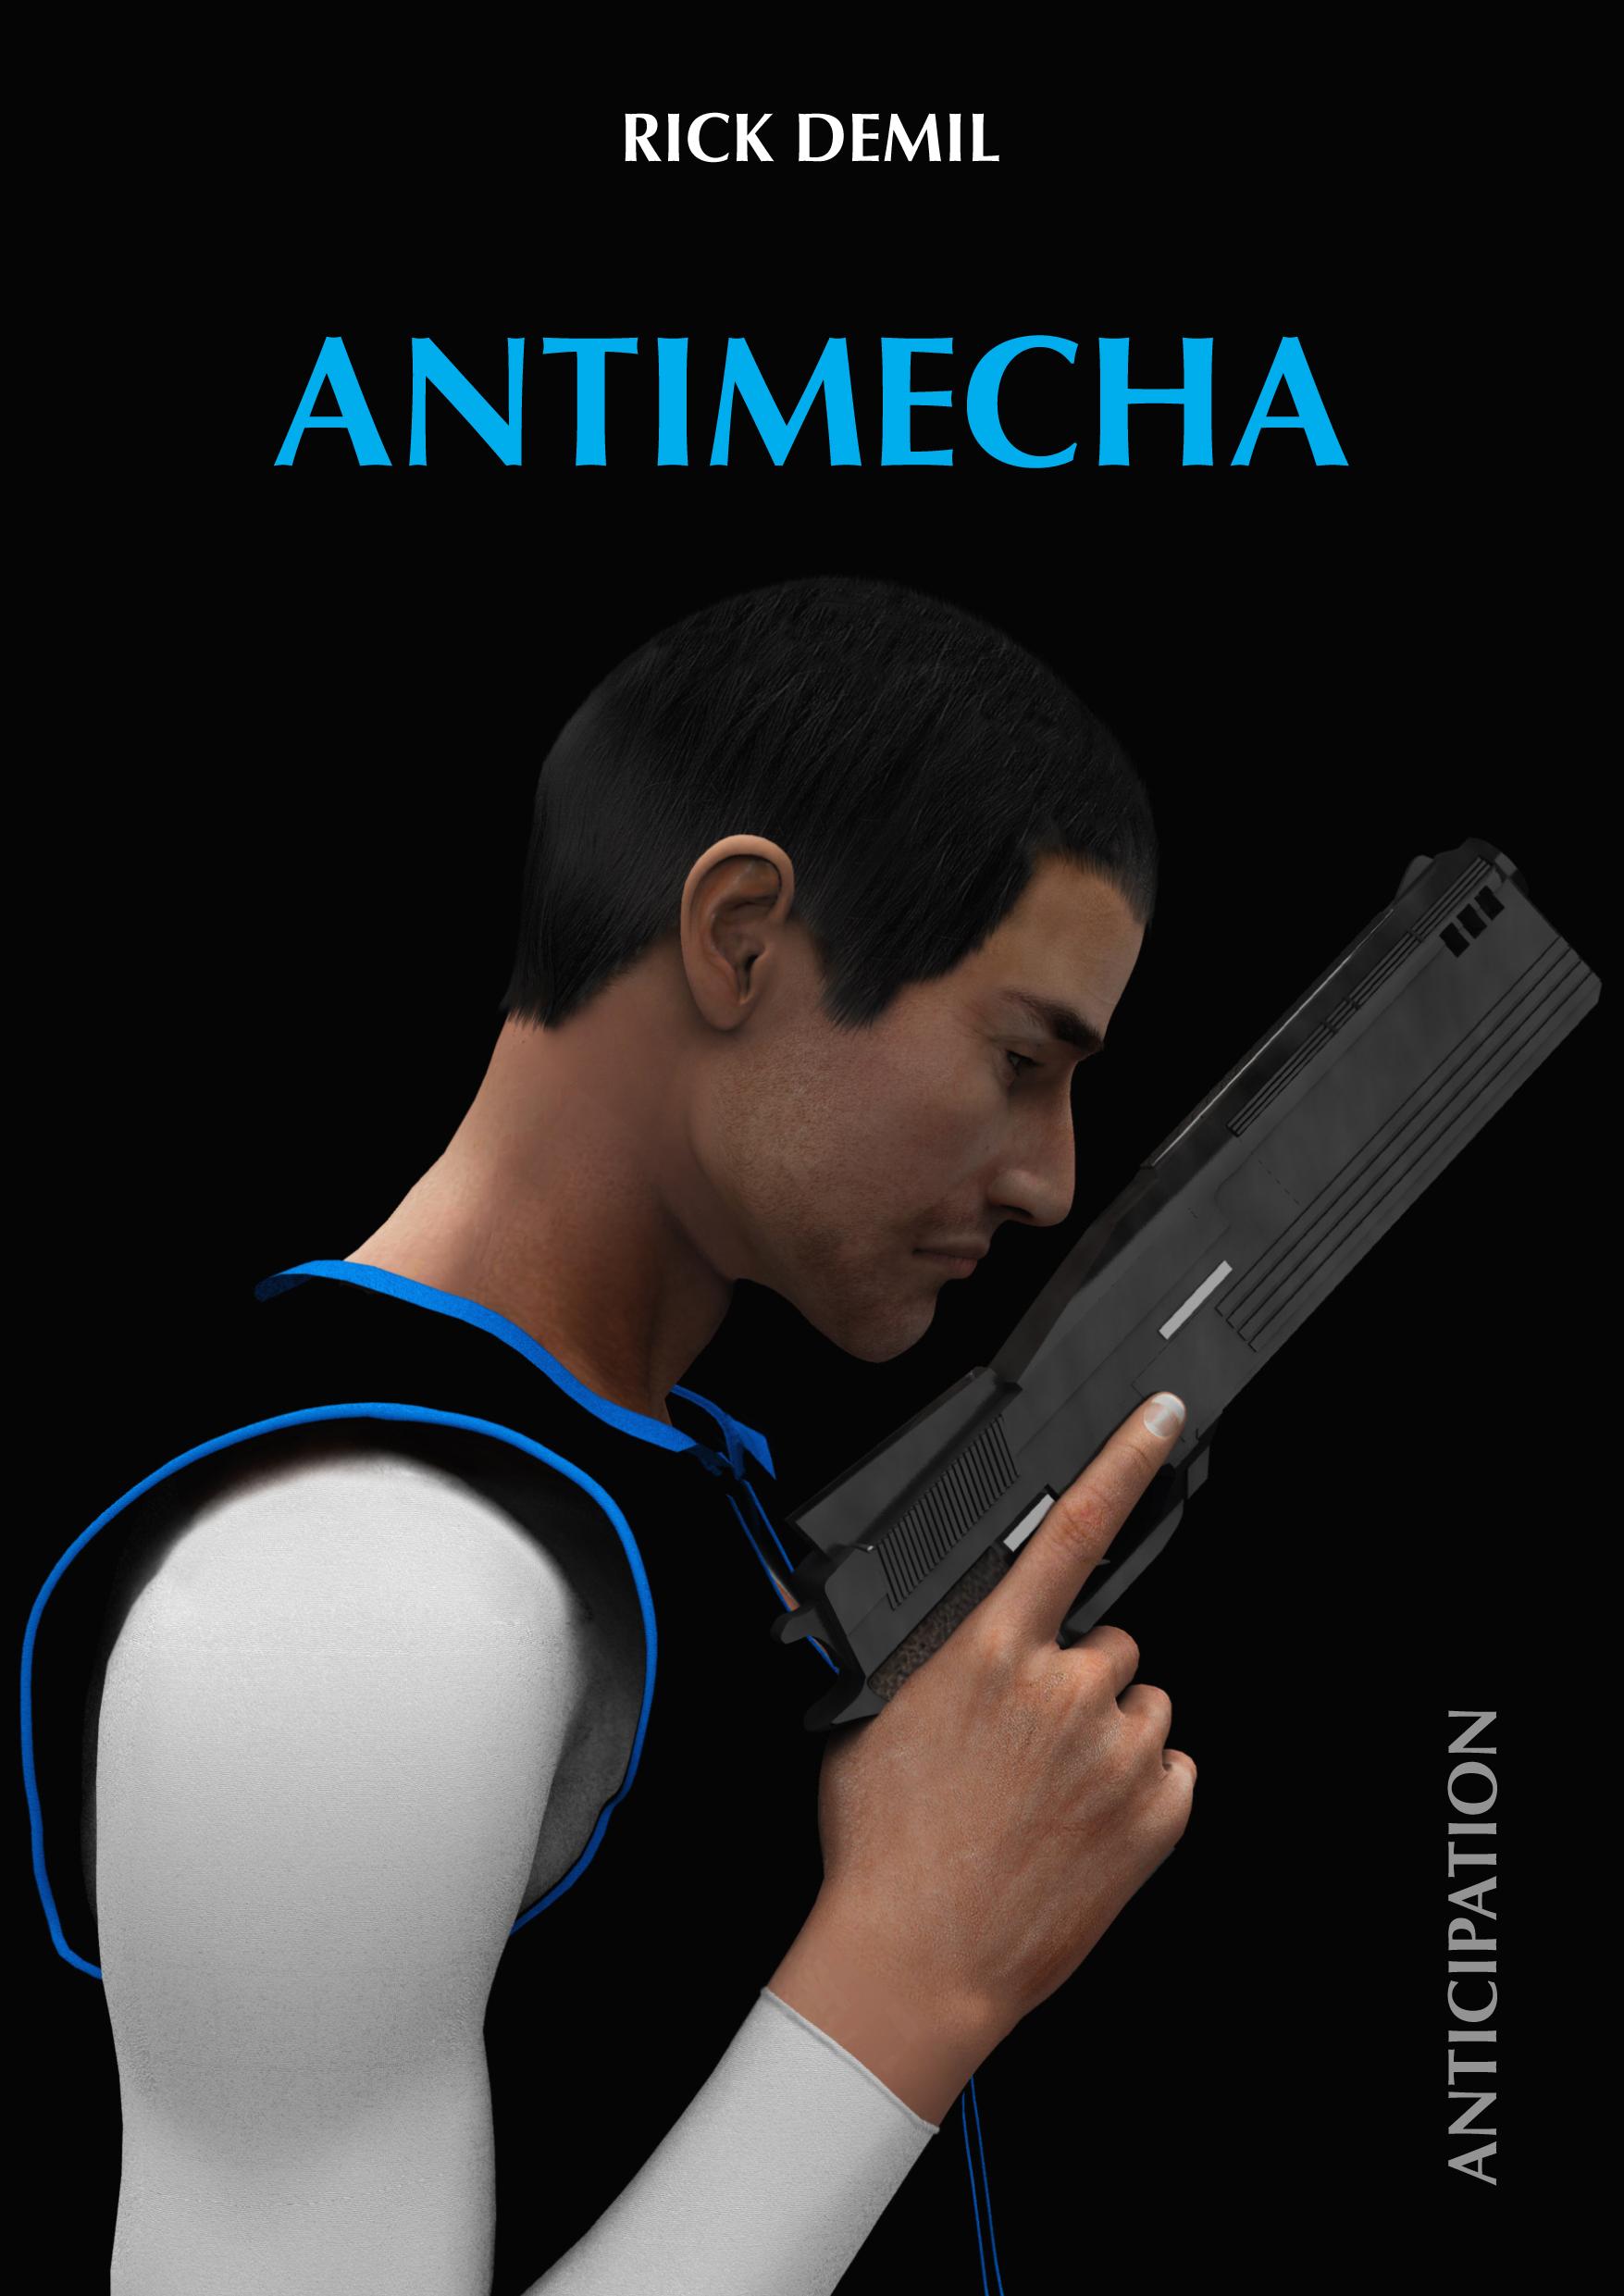 Antimecha